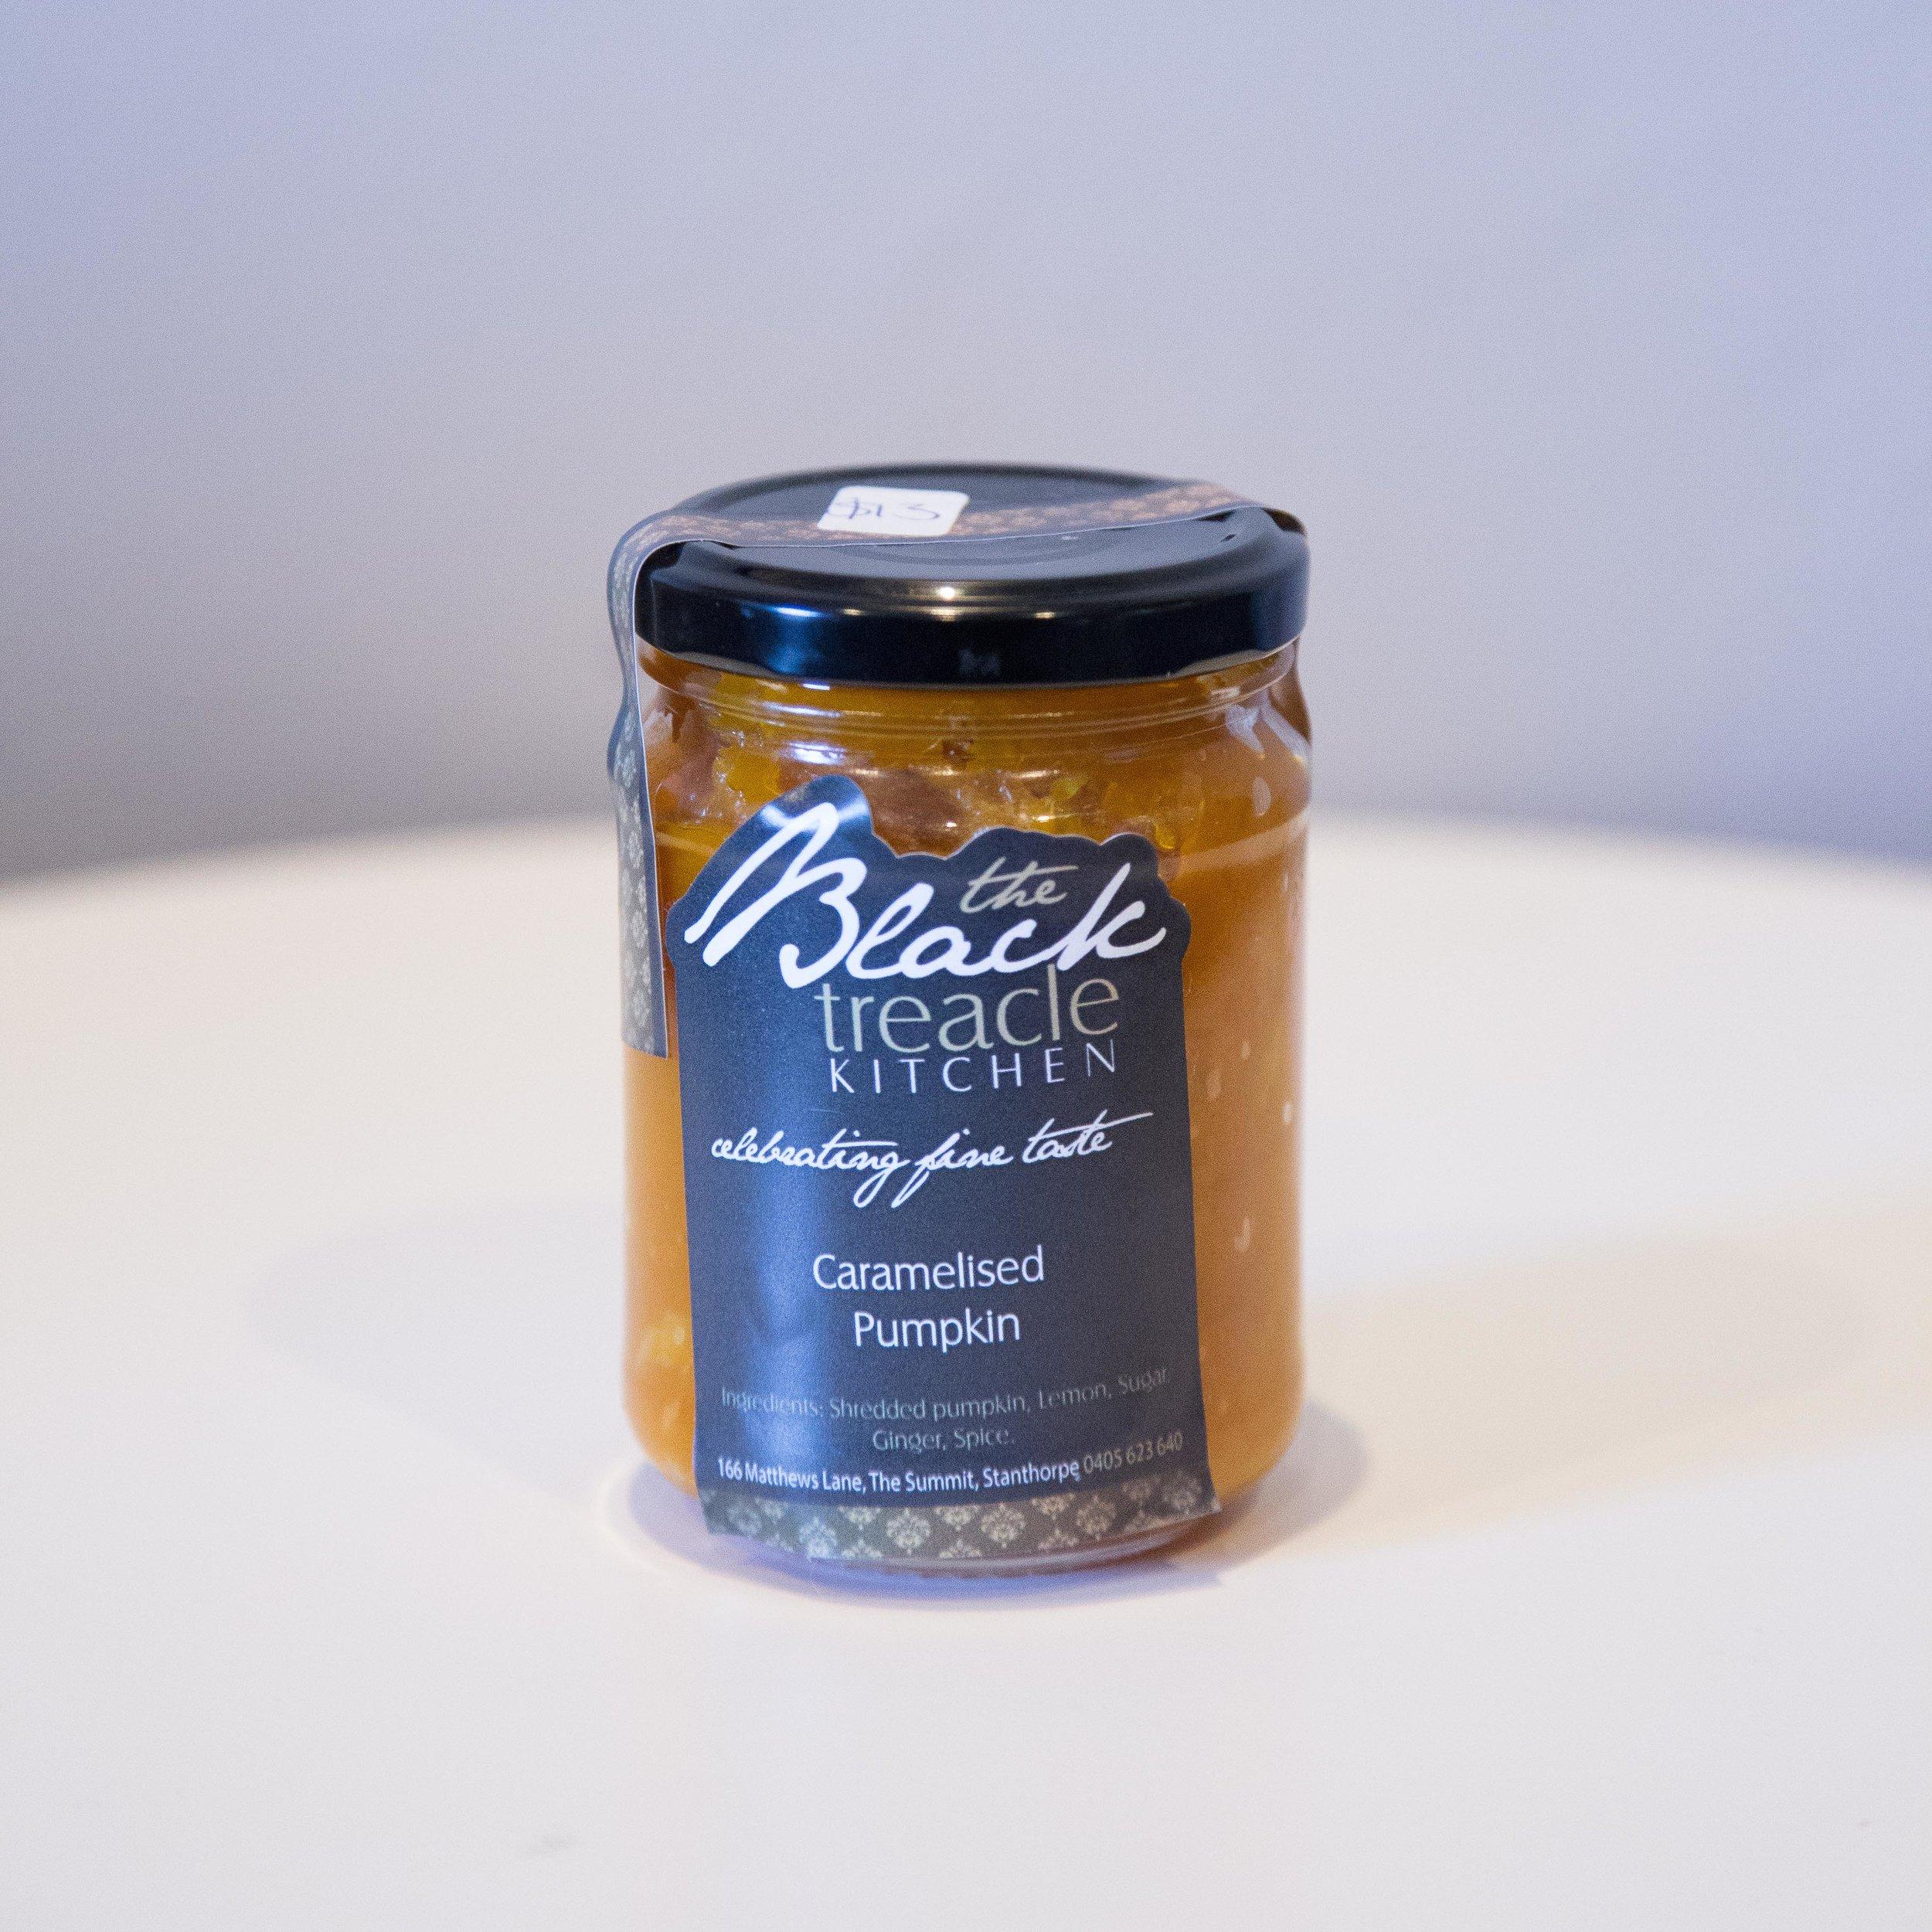 Black Treacle - Caramelised Pumpkin  - $12